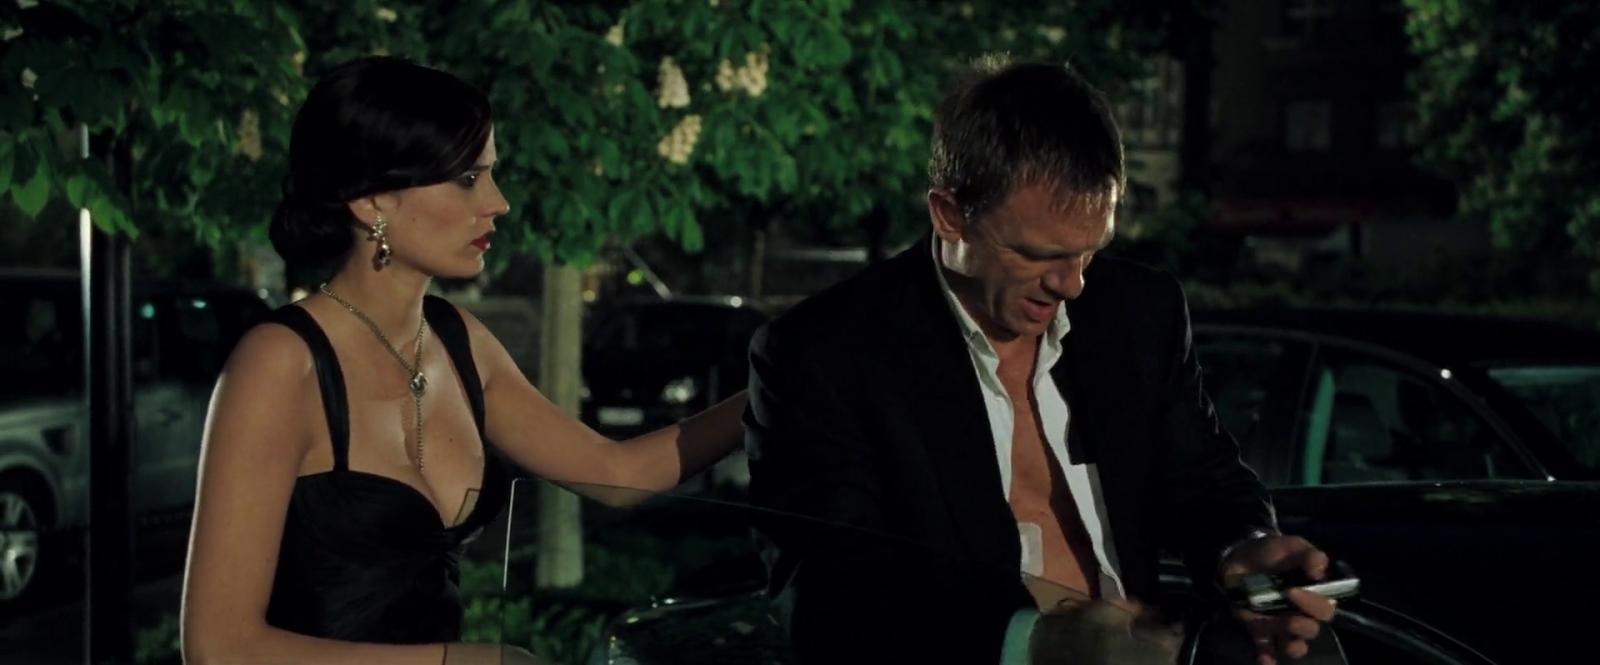 007 casino royale online ingles subtitulada